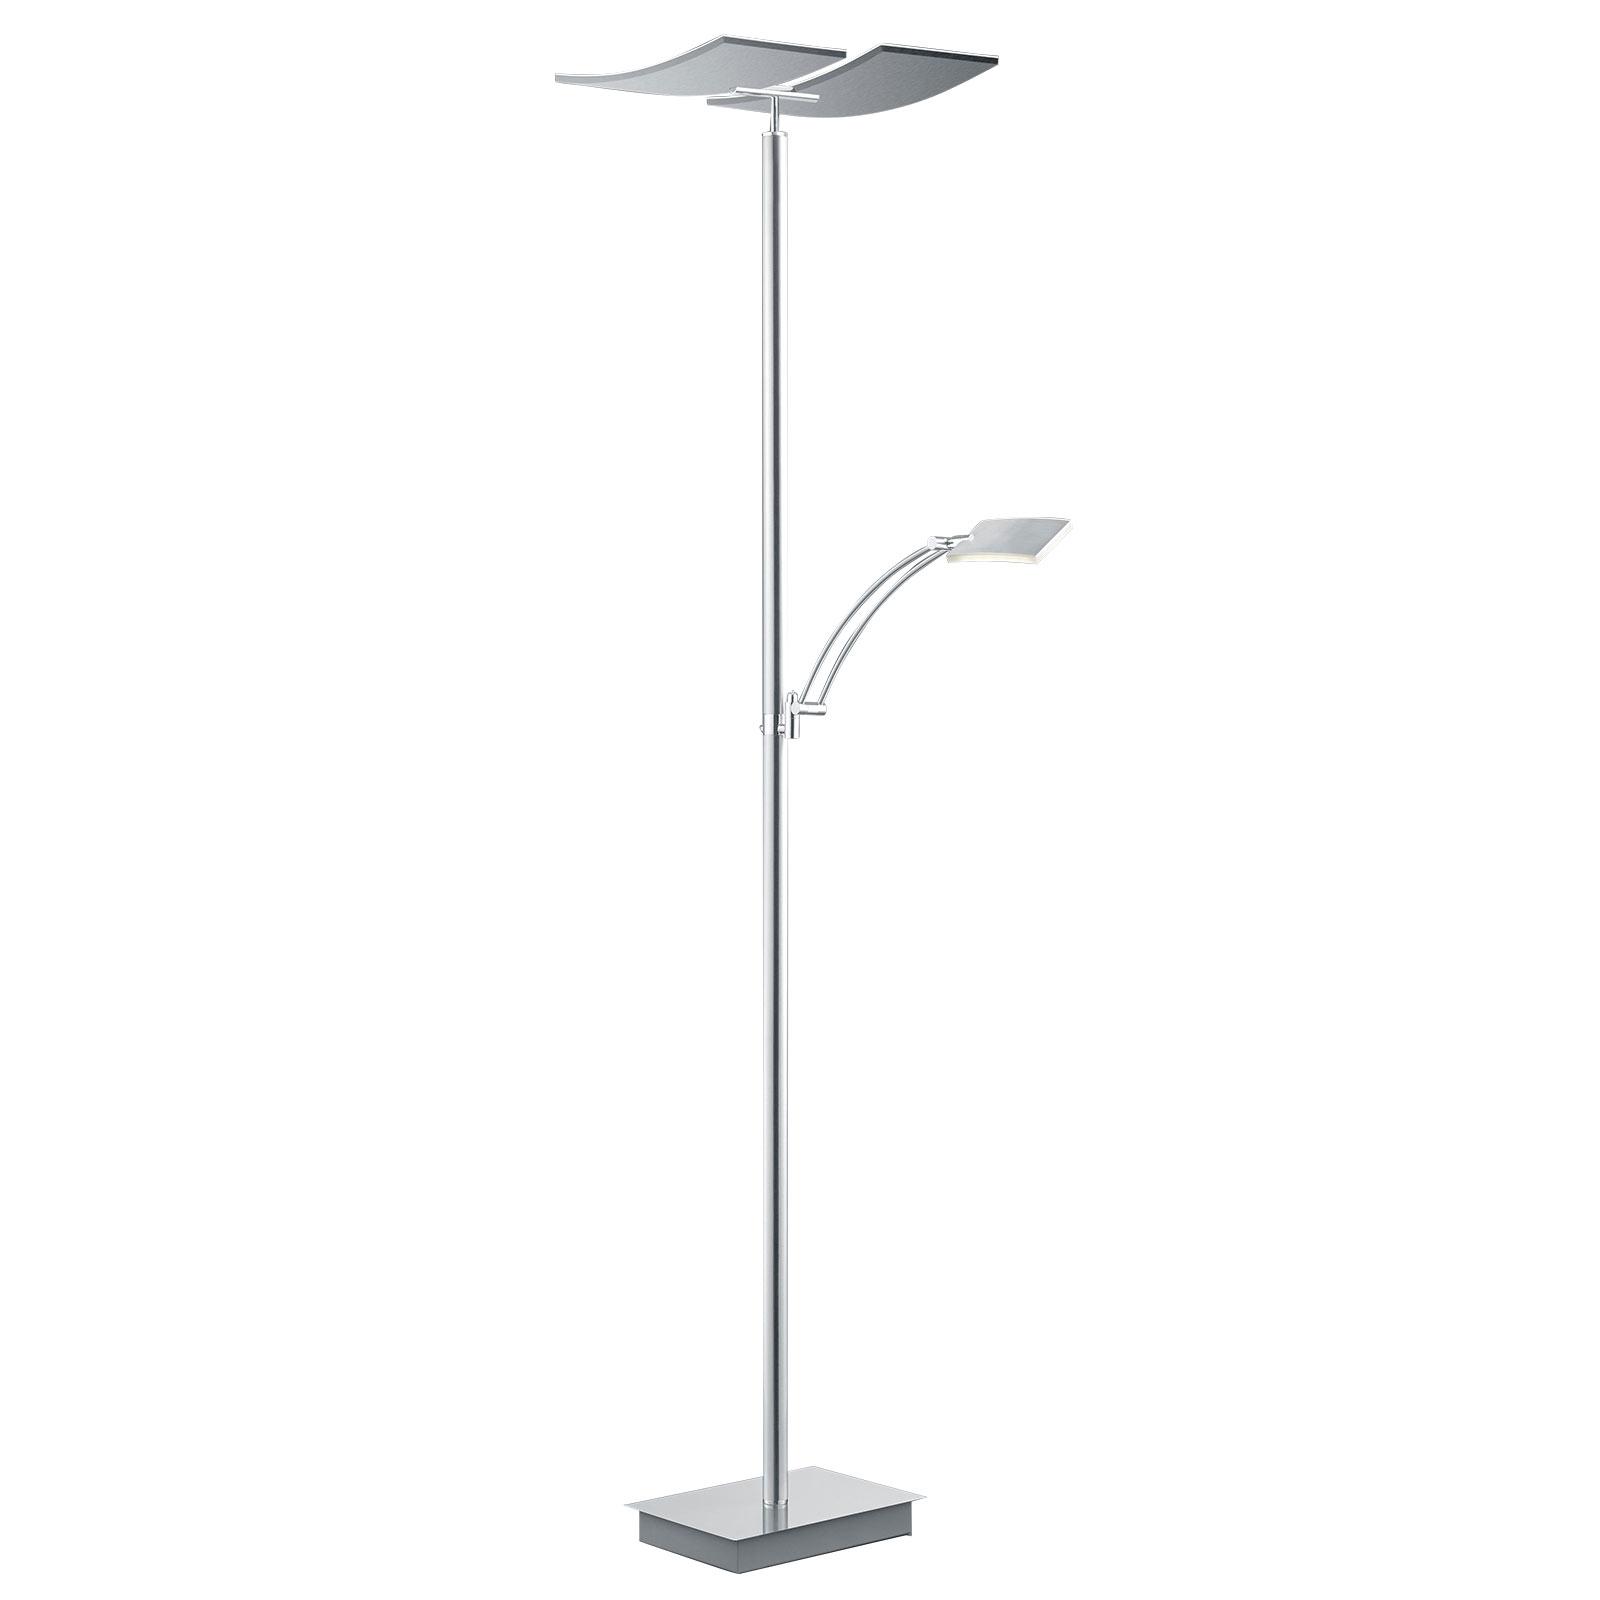 B-Leuchten Duo LED vloerlamp met afstandsbediening